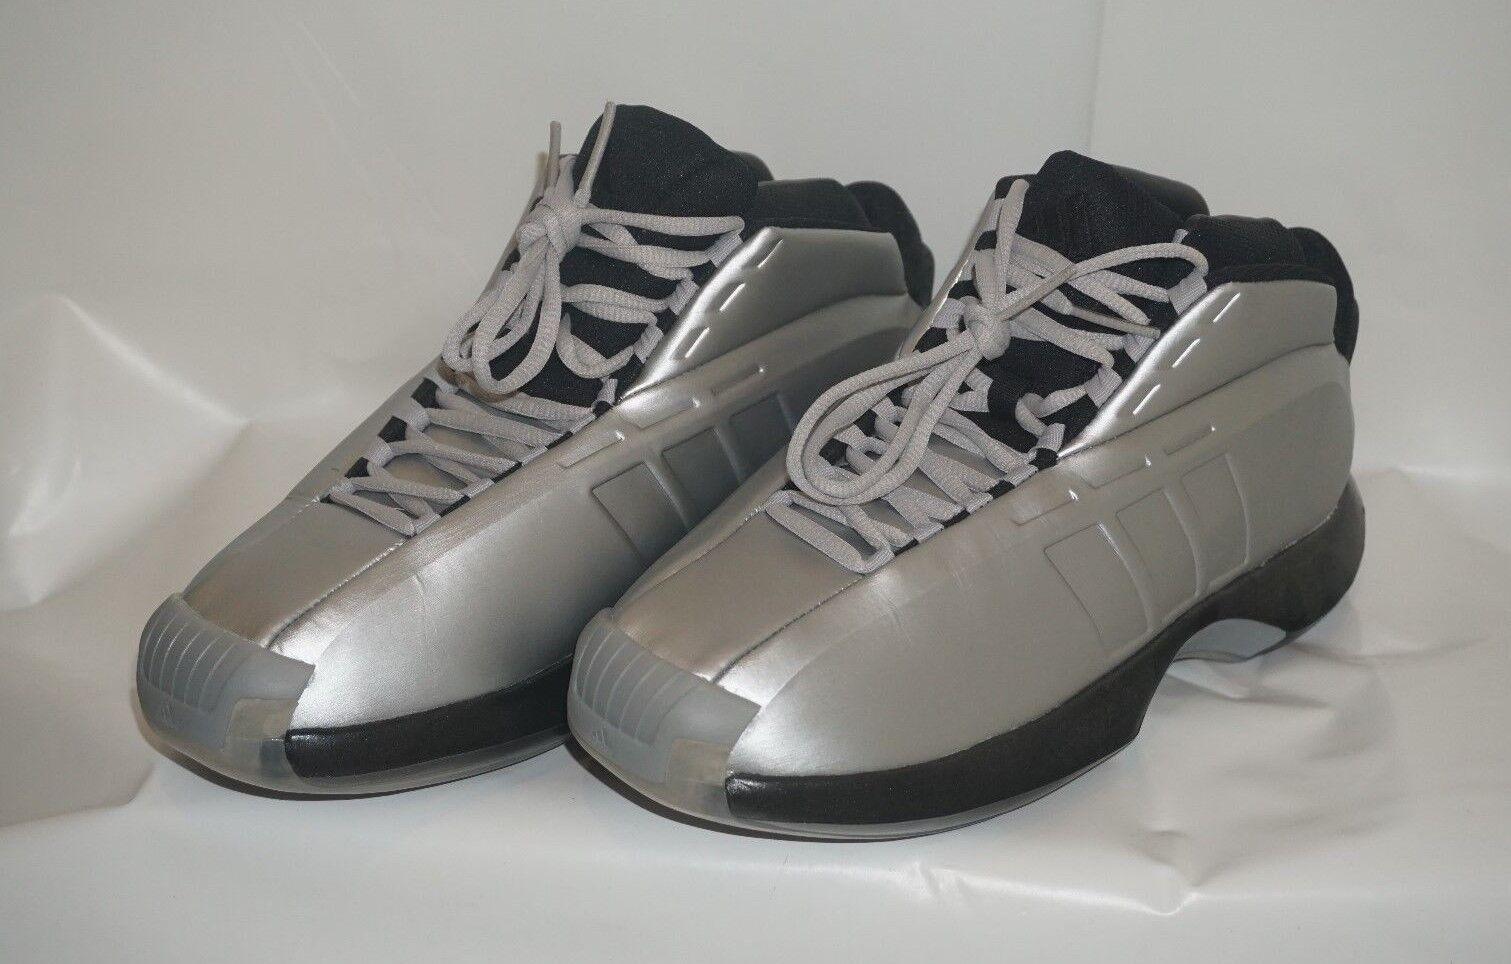 Men's Adidas CRAZY 1 BASKETBALL SHOES  - Size 8.5 US